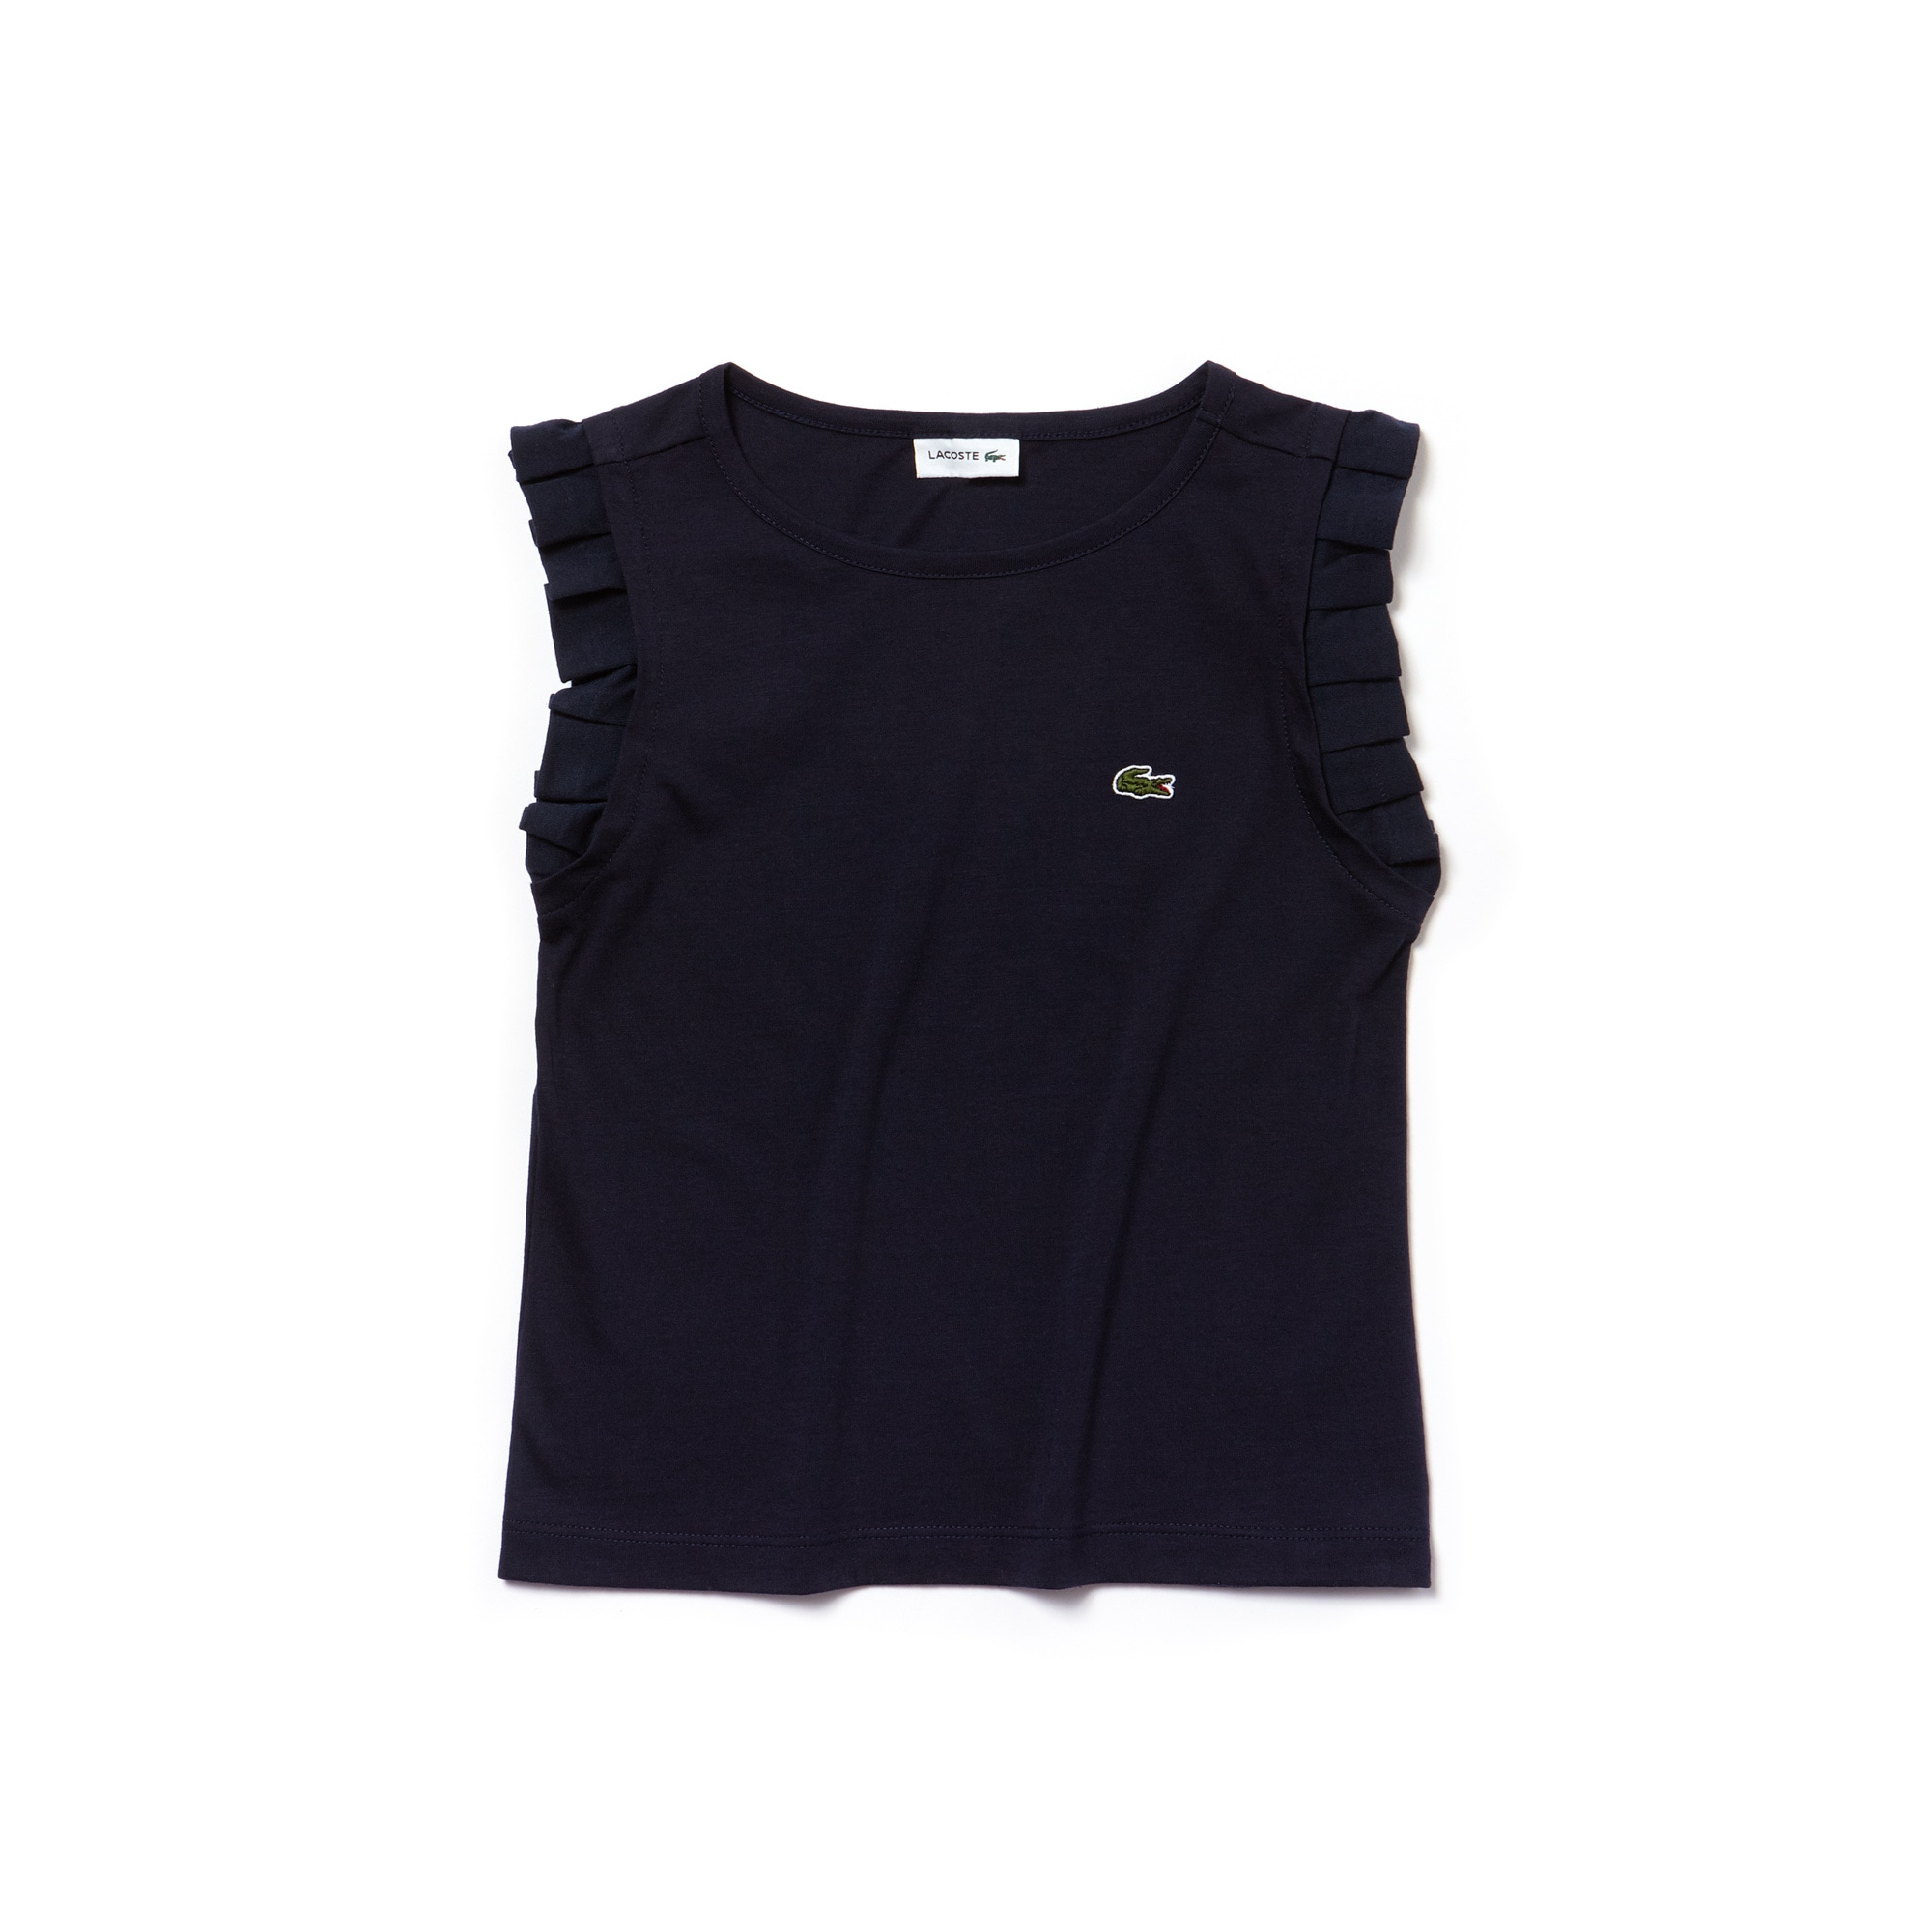 Camiseta Niña Con Cuello Redondo De Punto Liso Con Volantes En Los Hombros